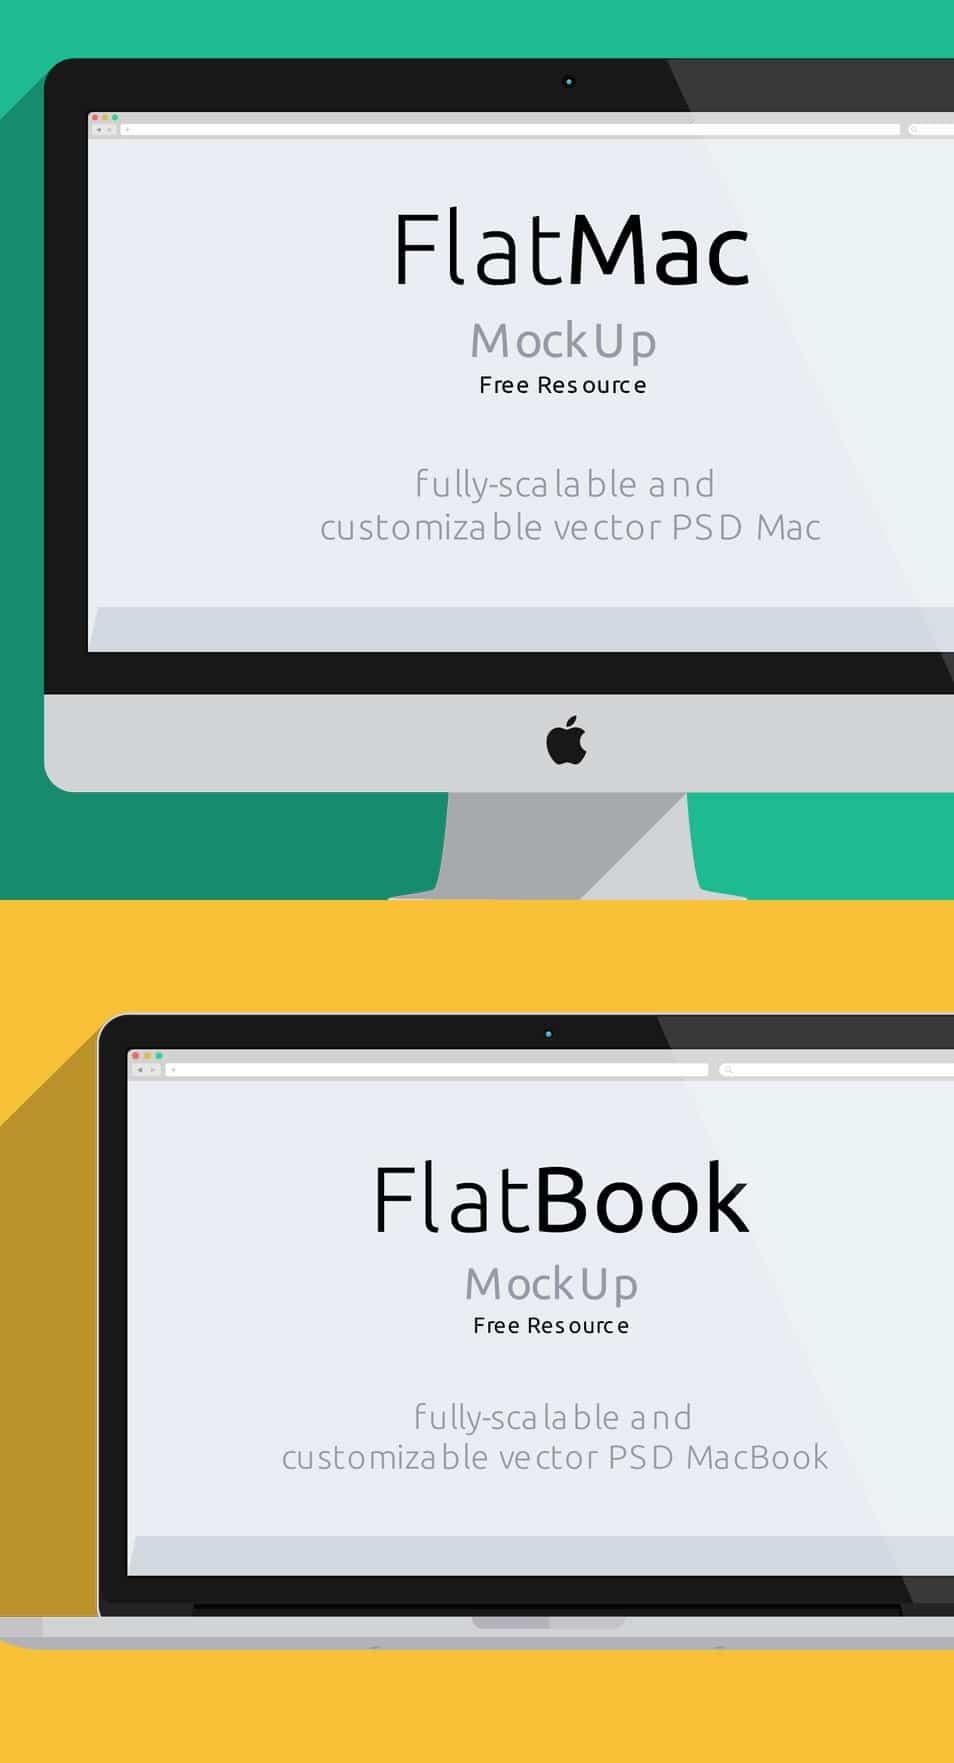 iMac & Macbook Psd Flat Mockup